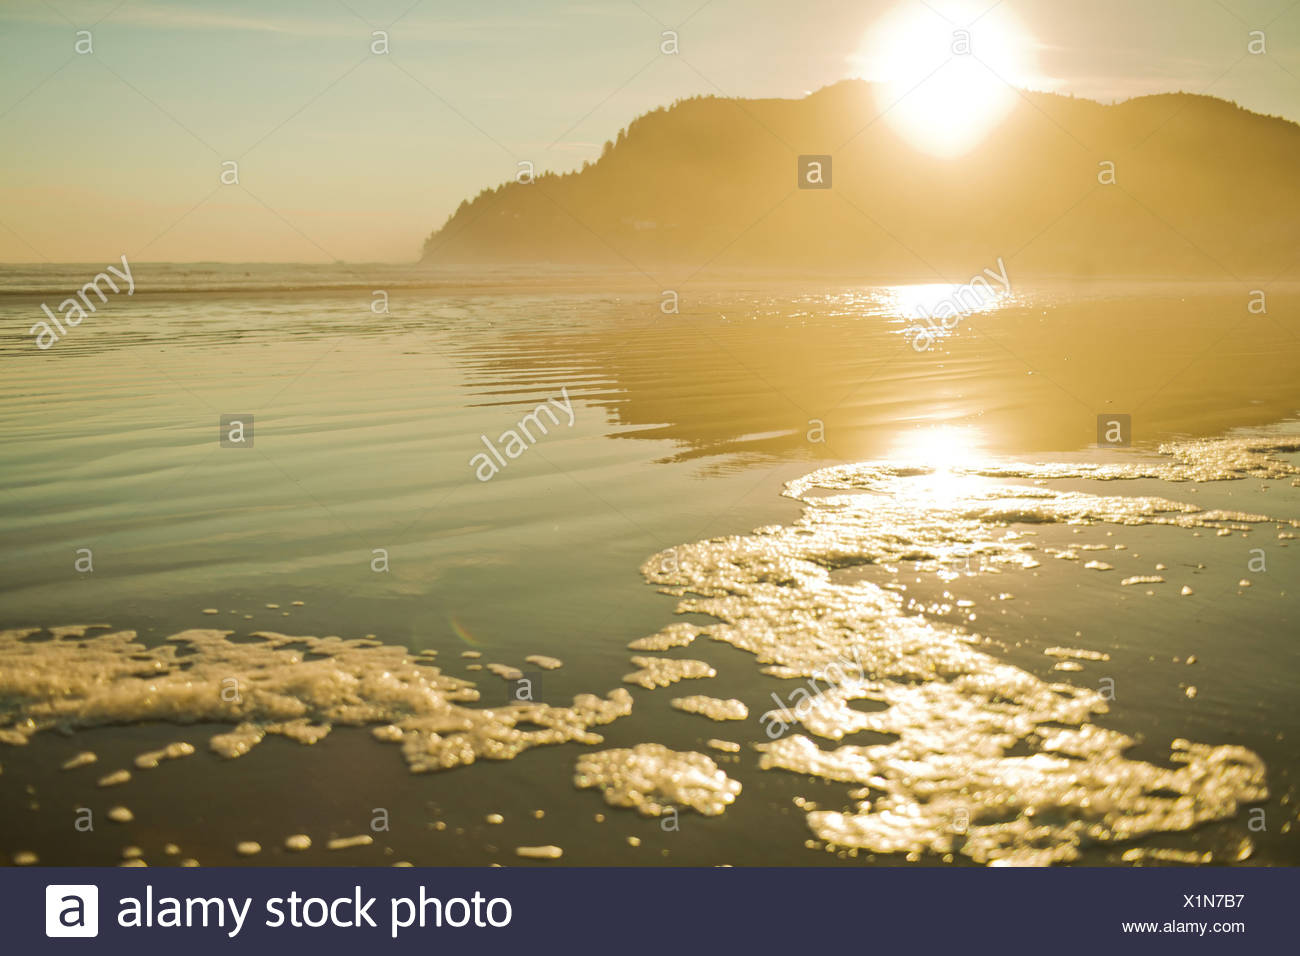 Sunset over mountain and ocean, Seaside, Oregon, USA - Stock Image